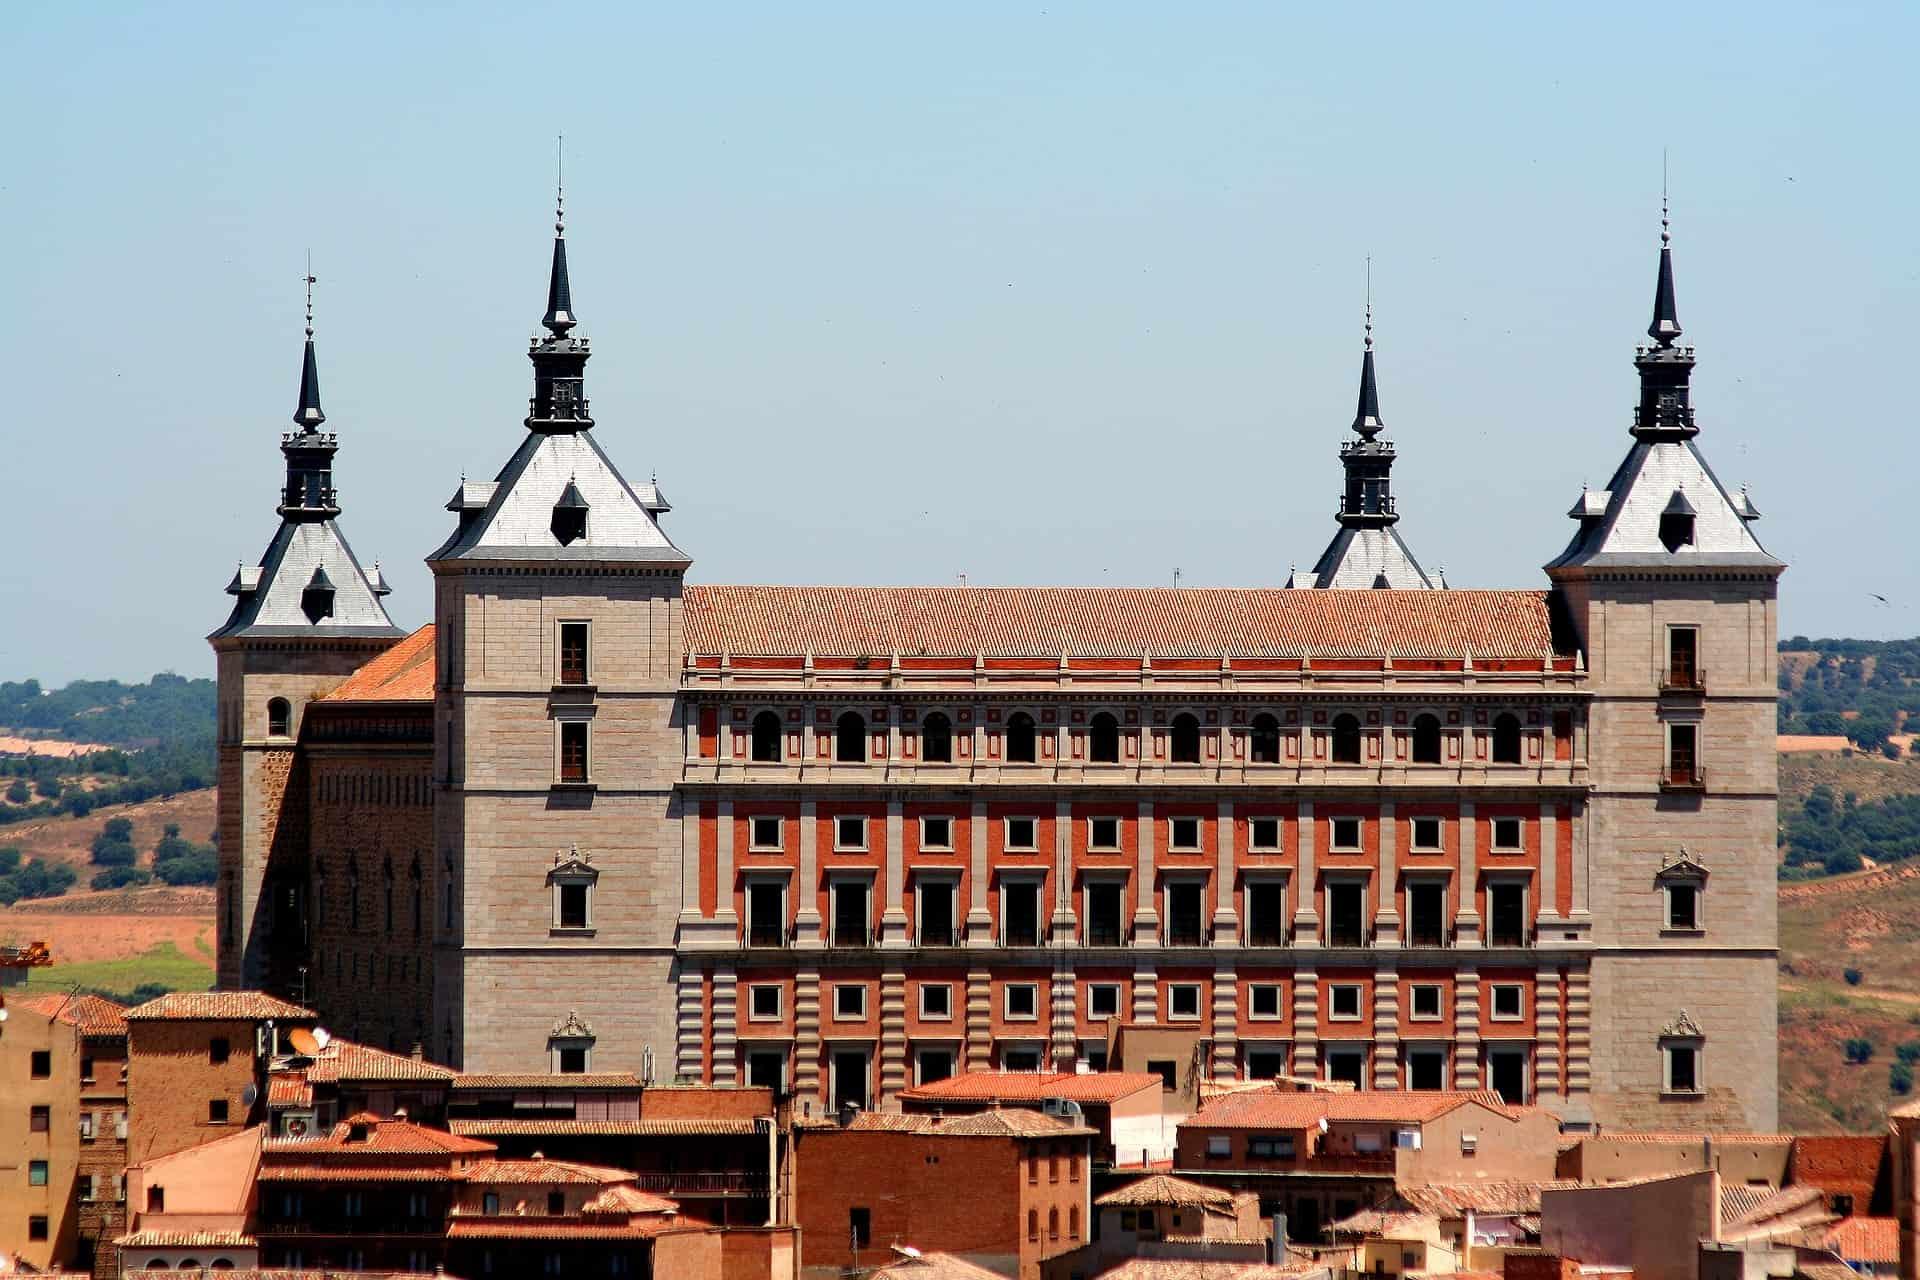 The Alcazar of Toledo, a military museum